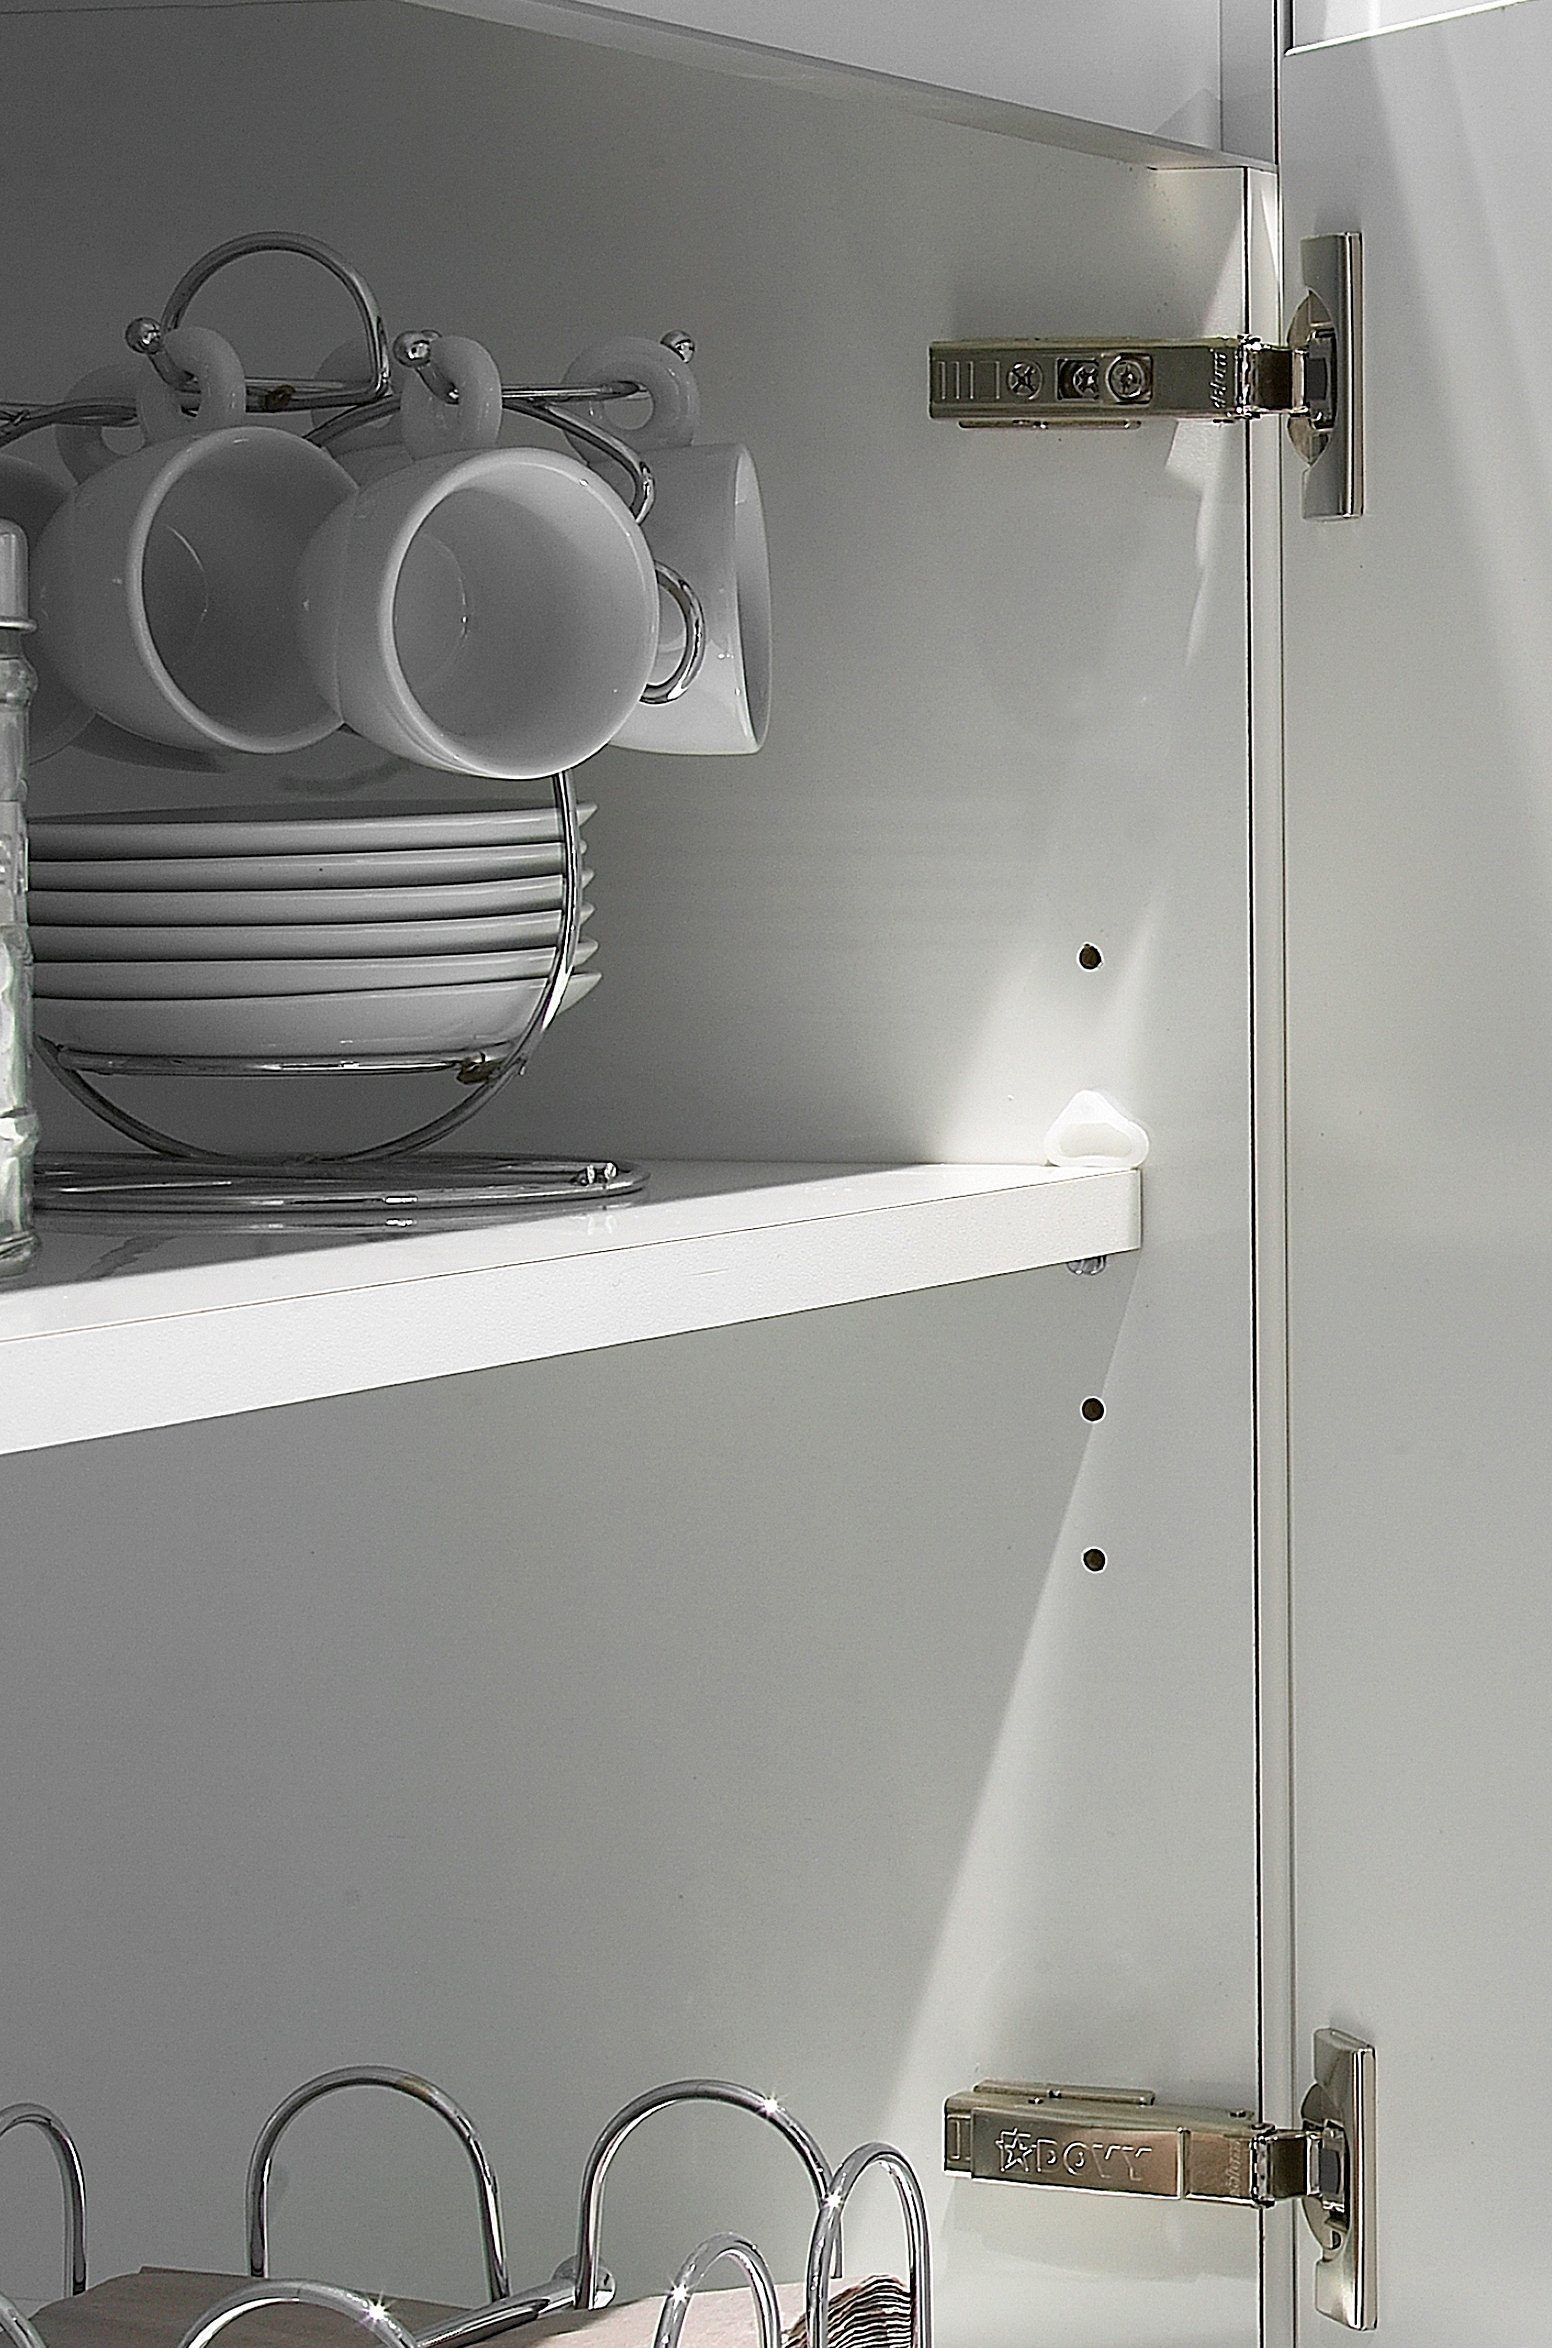 Dovy Keukens Laminaat : Waarom glanzend laminaat aan de binnenkant? Dovy keukens